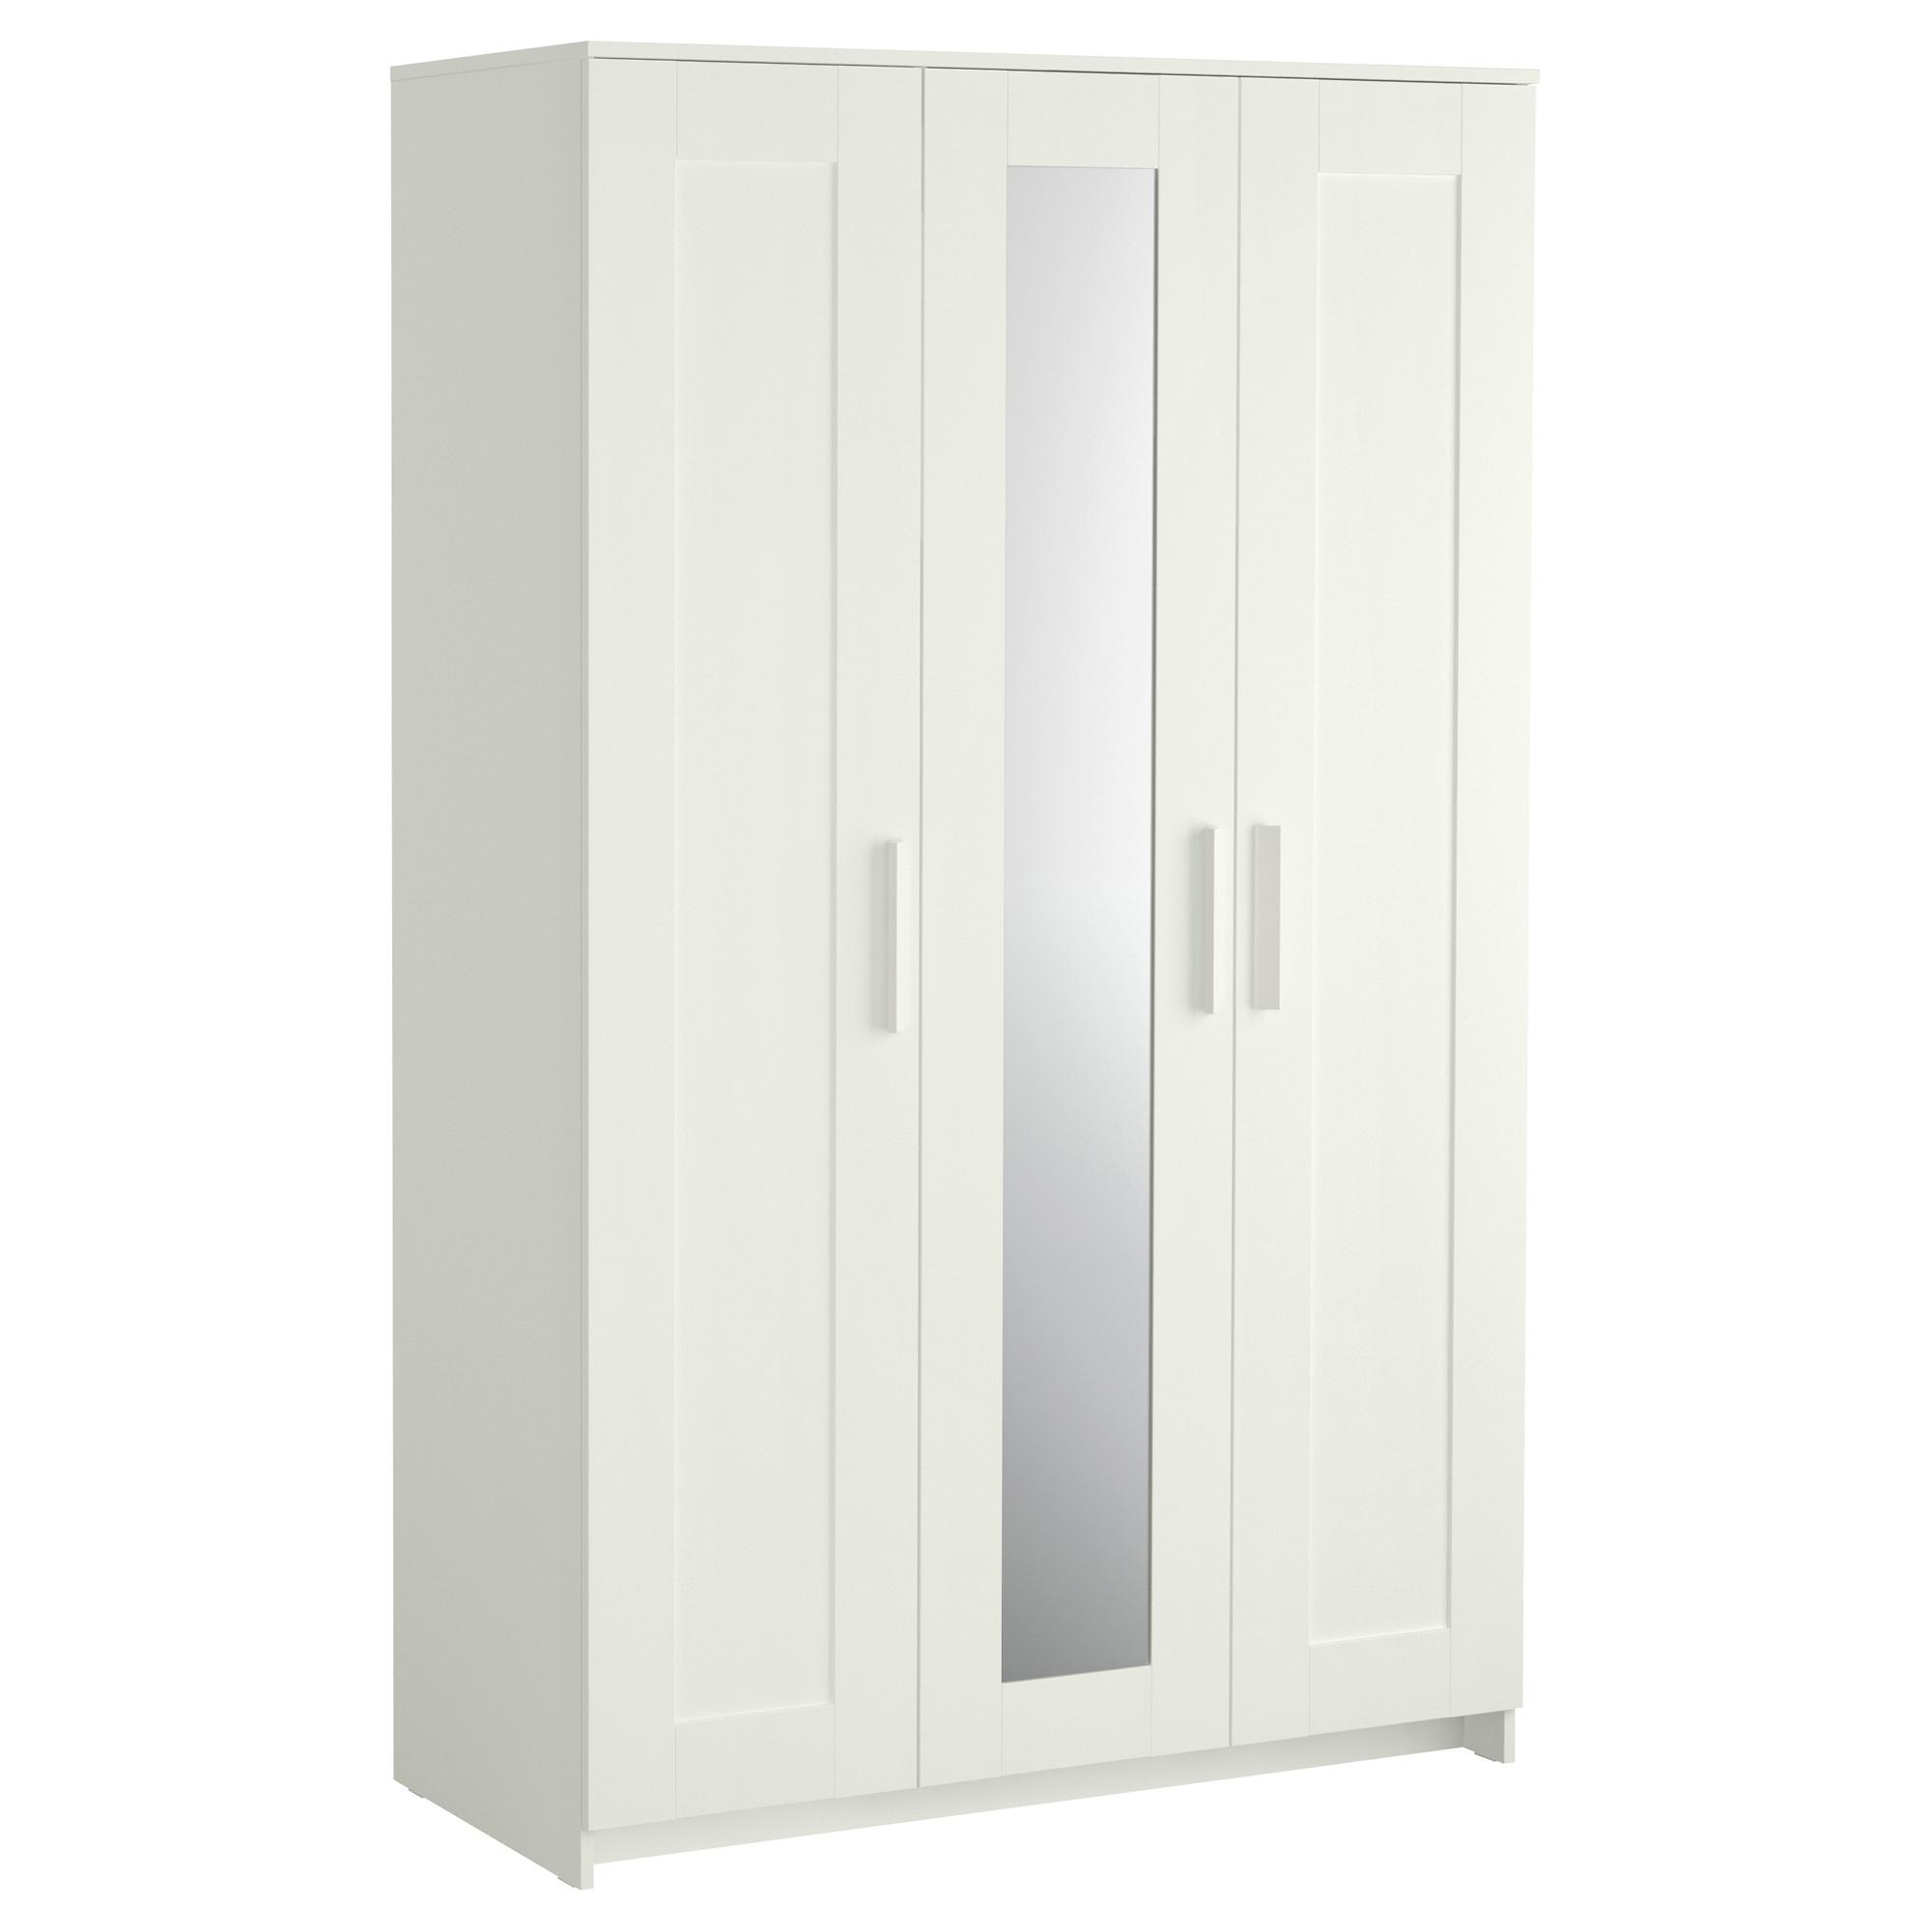 Current Brimnes Wardrobe With 3 Doors – White – Ikea Inside White 3 Door Wardrobes (View 13 of 15)